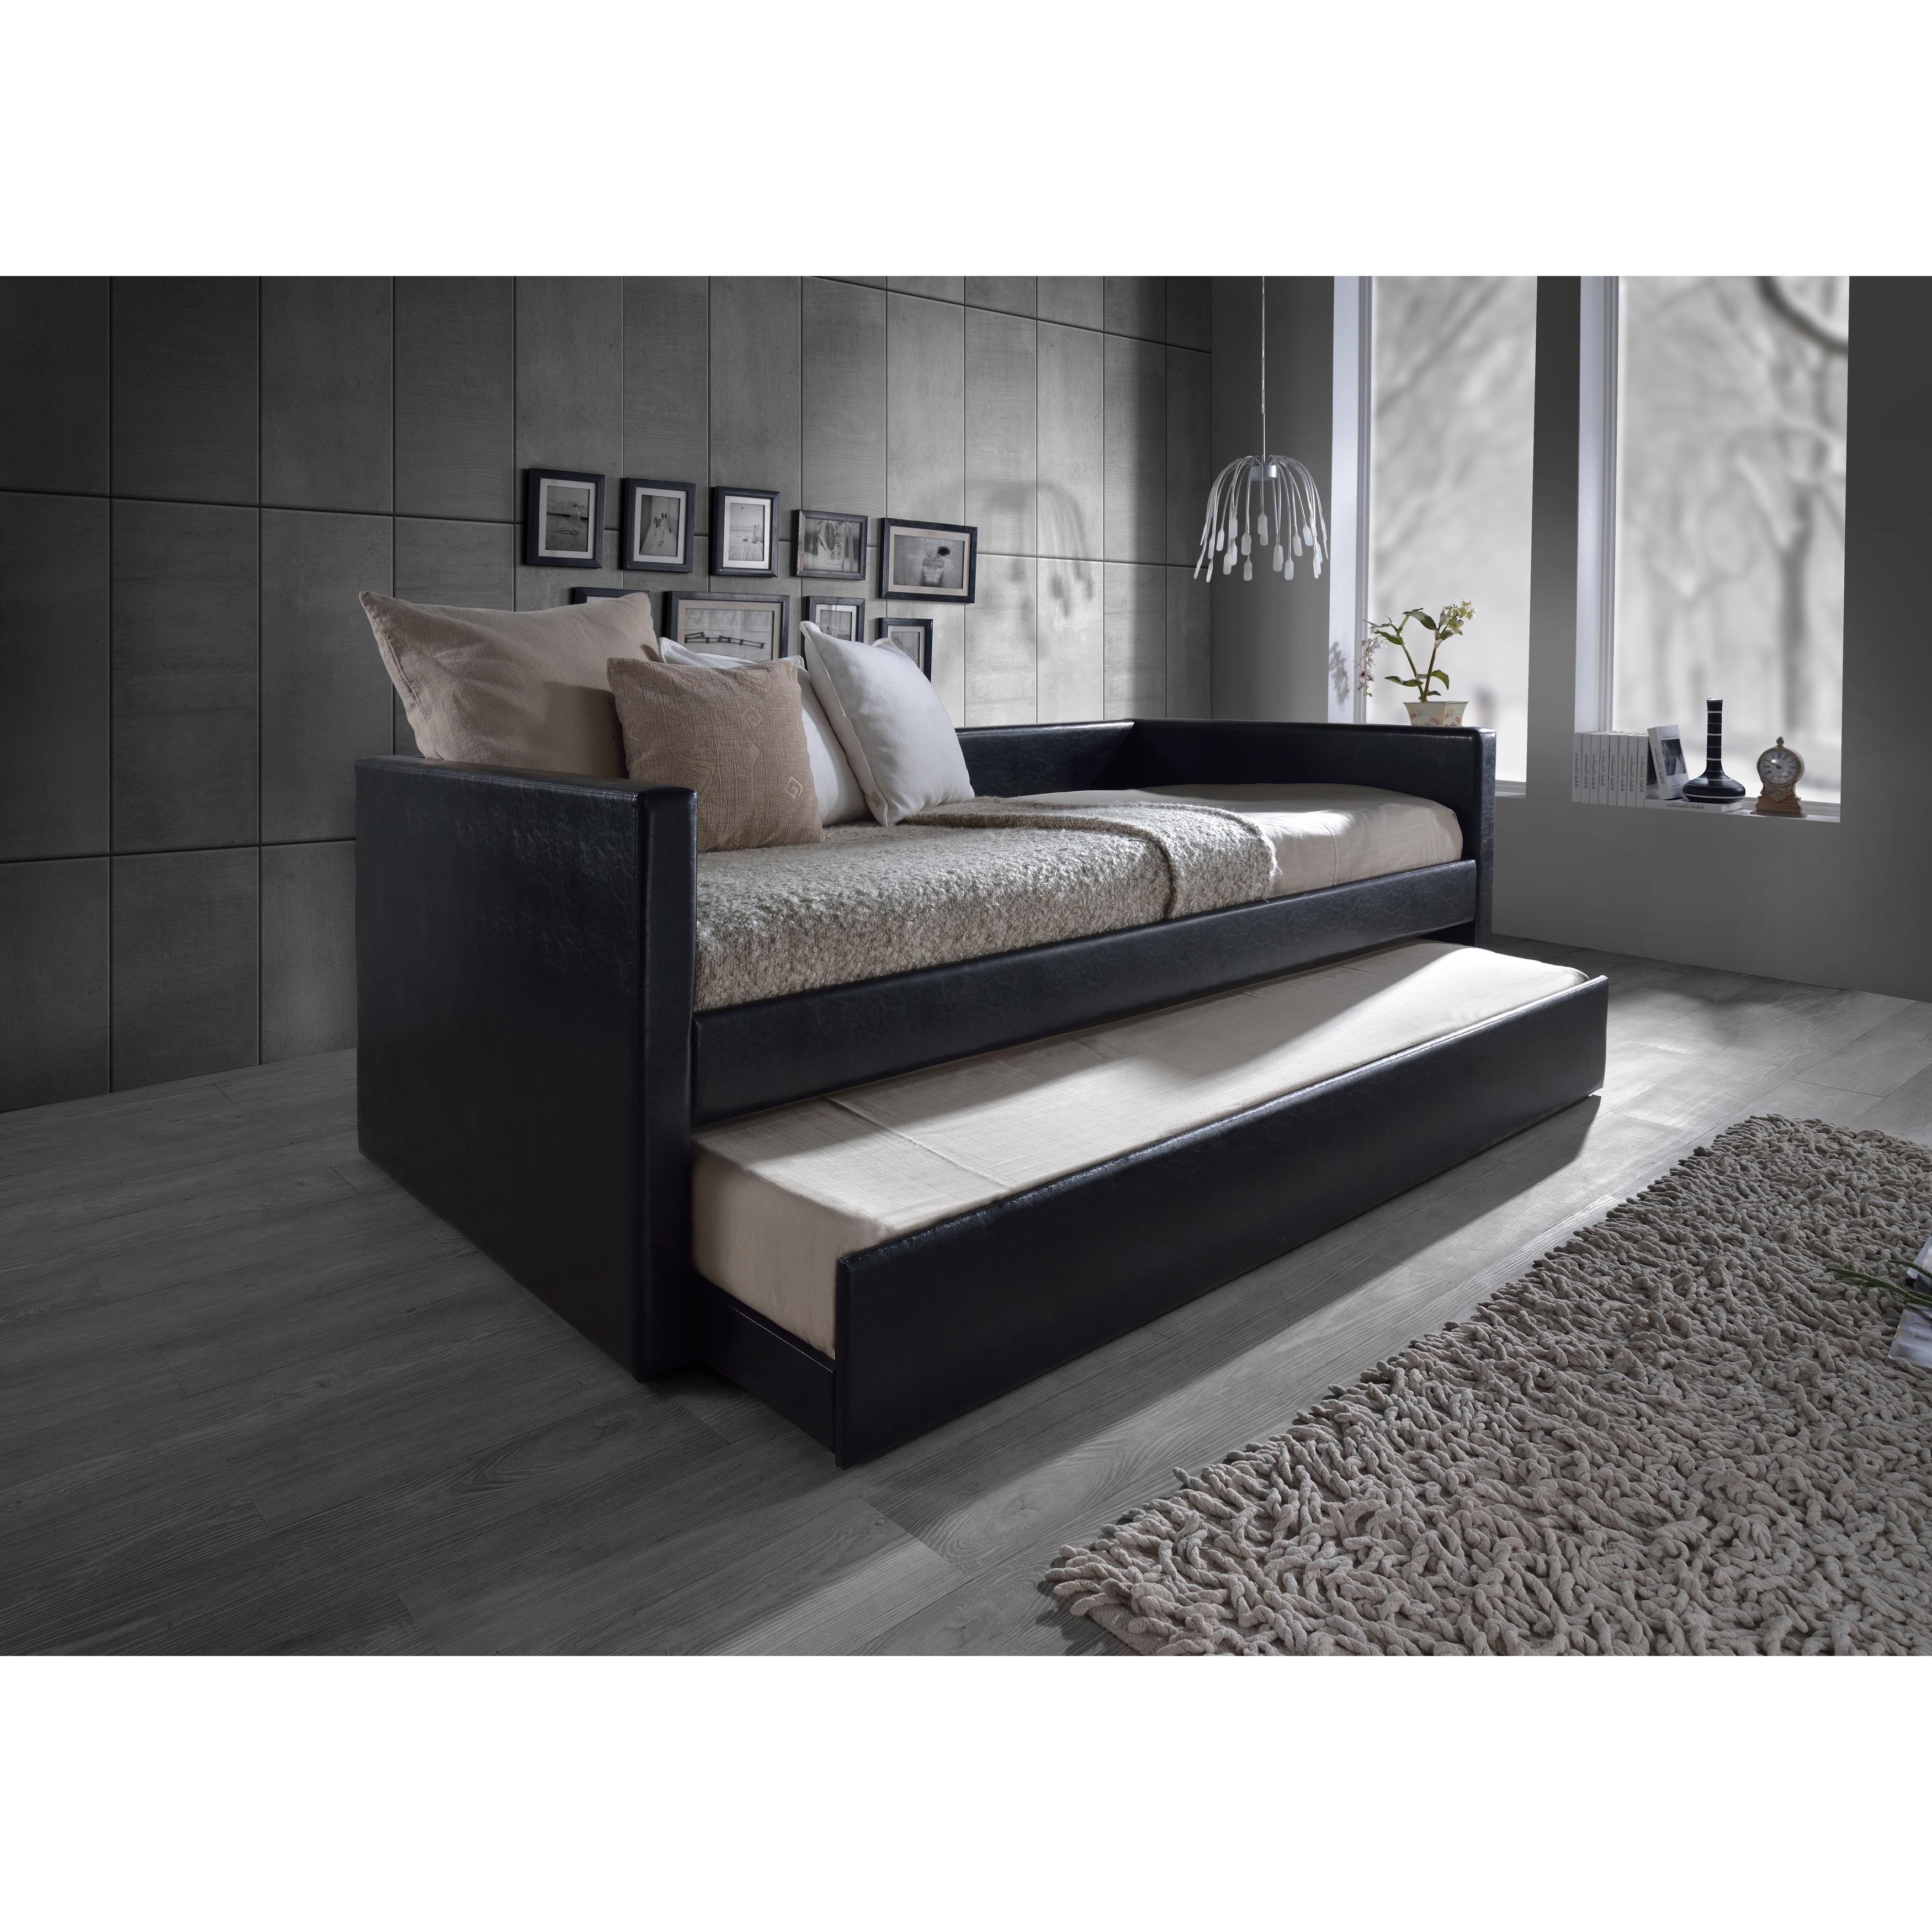 Baxton Studio Risom Contemporary Black Twin-size Platform...